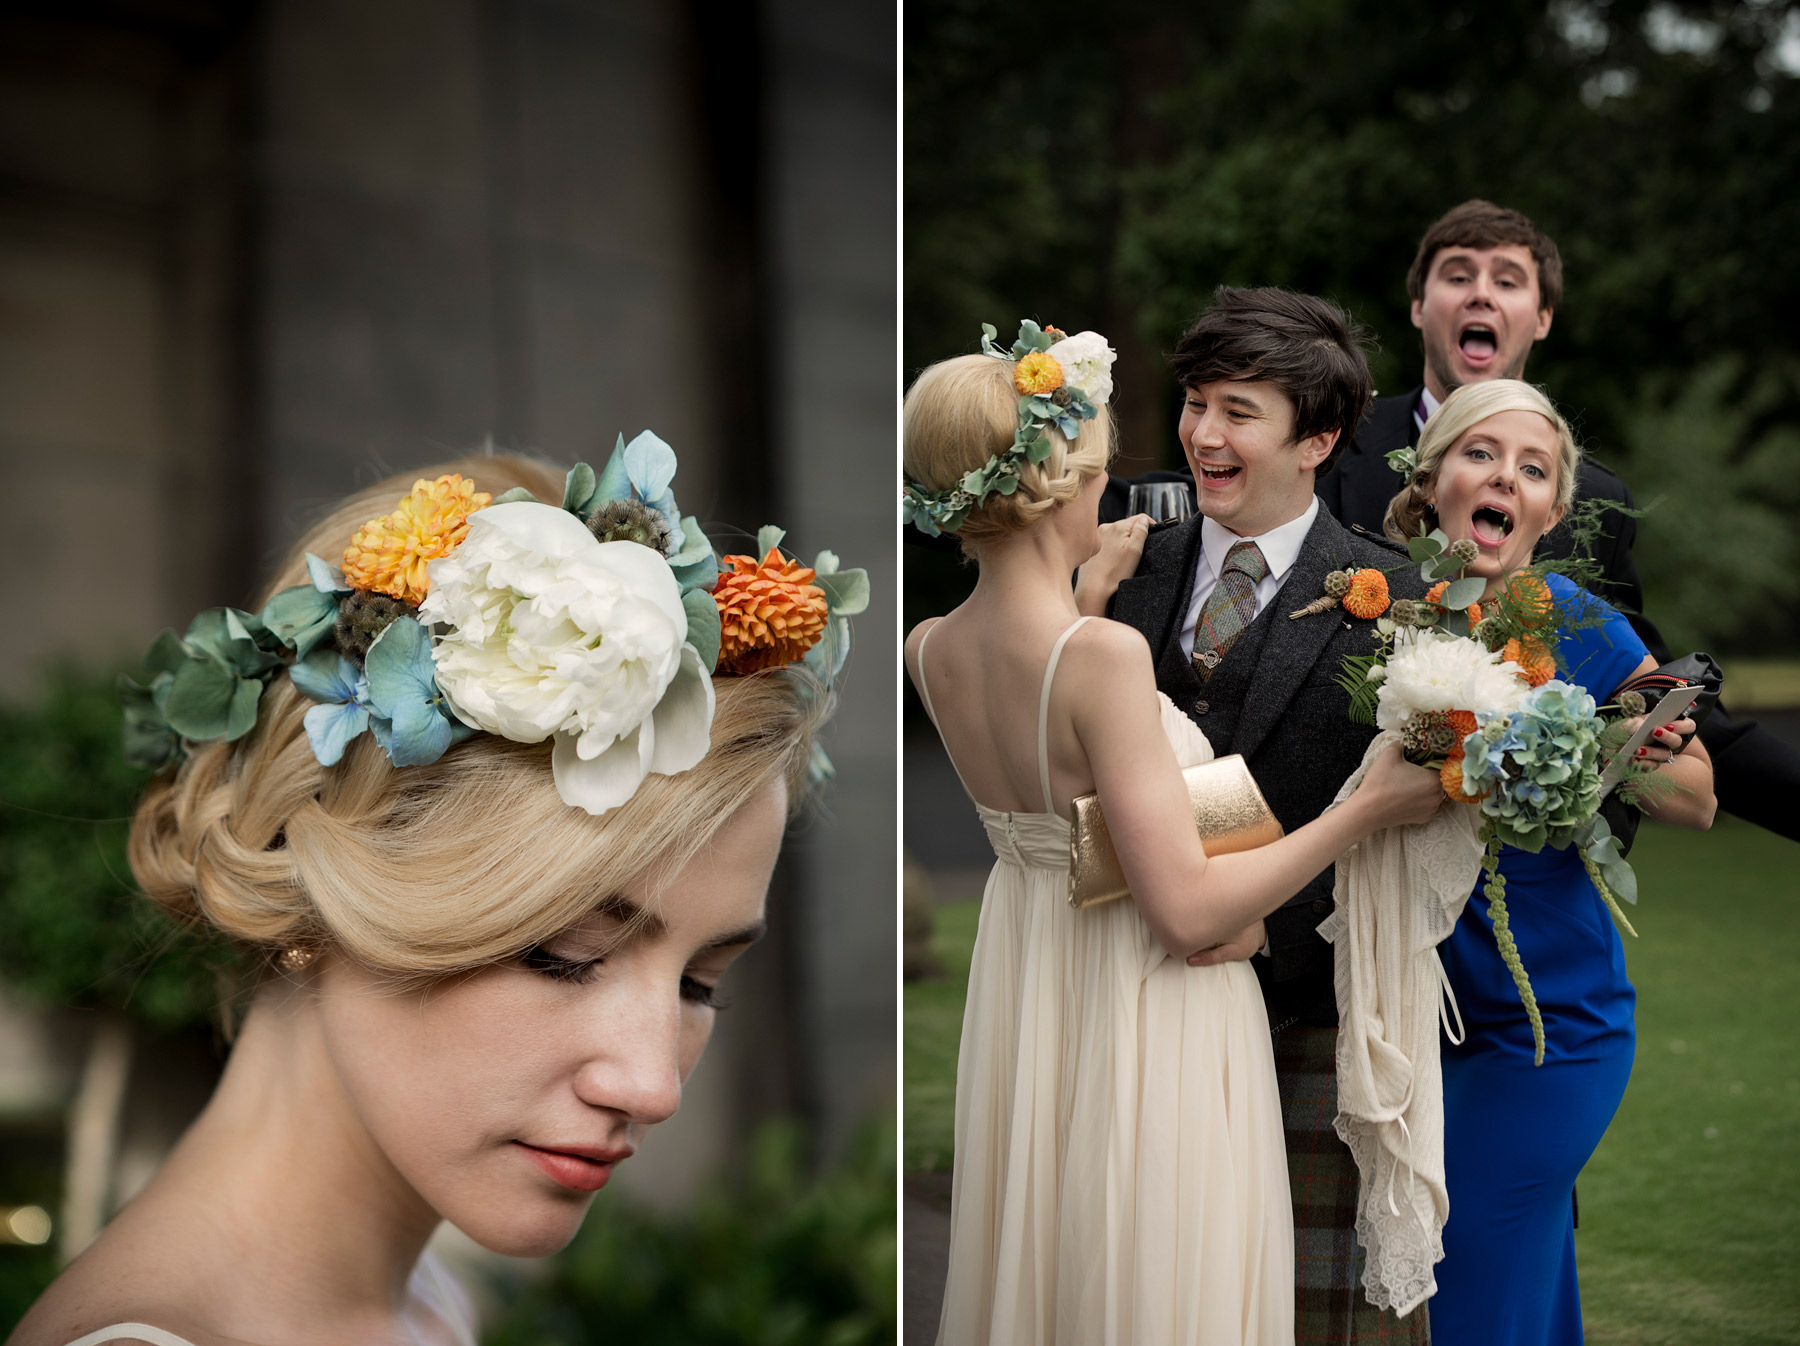 wedding photo bombing in scotland